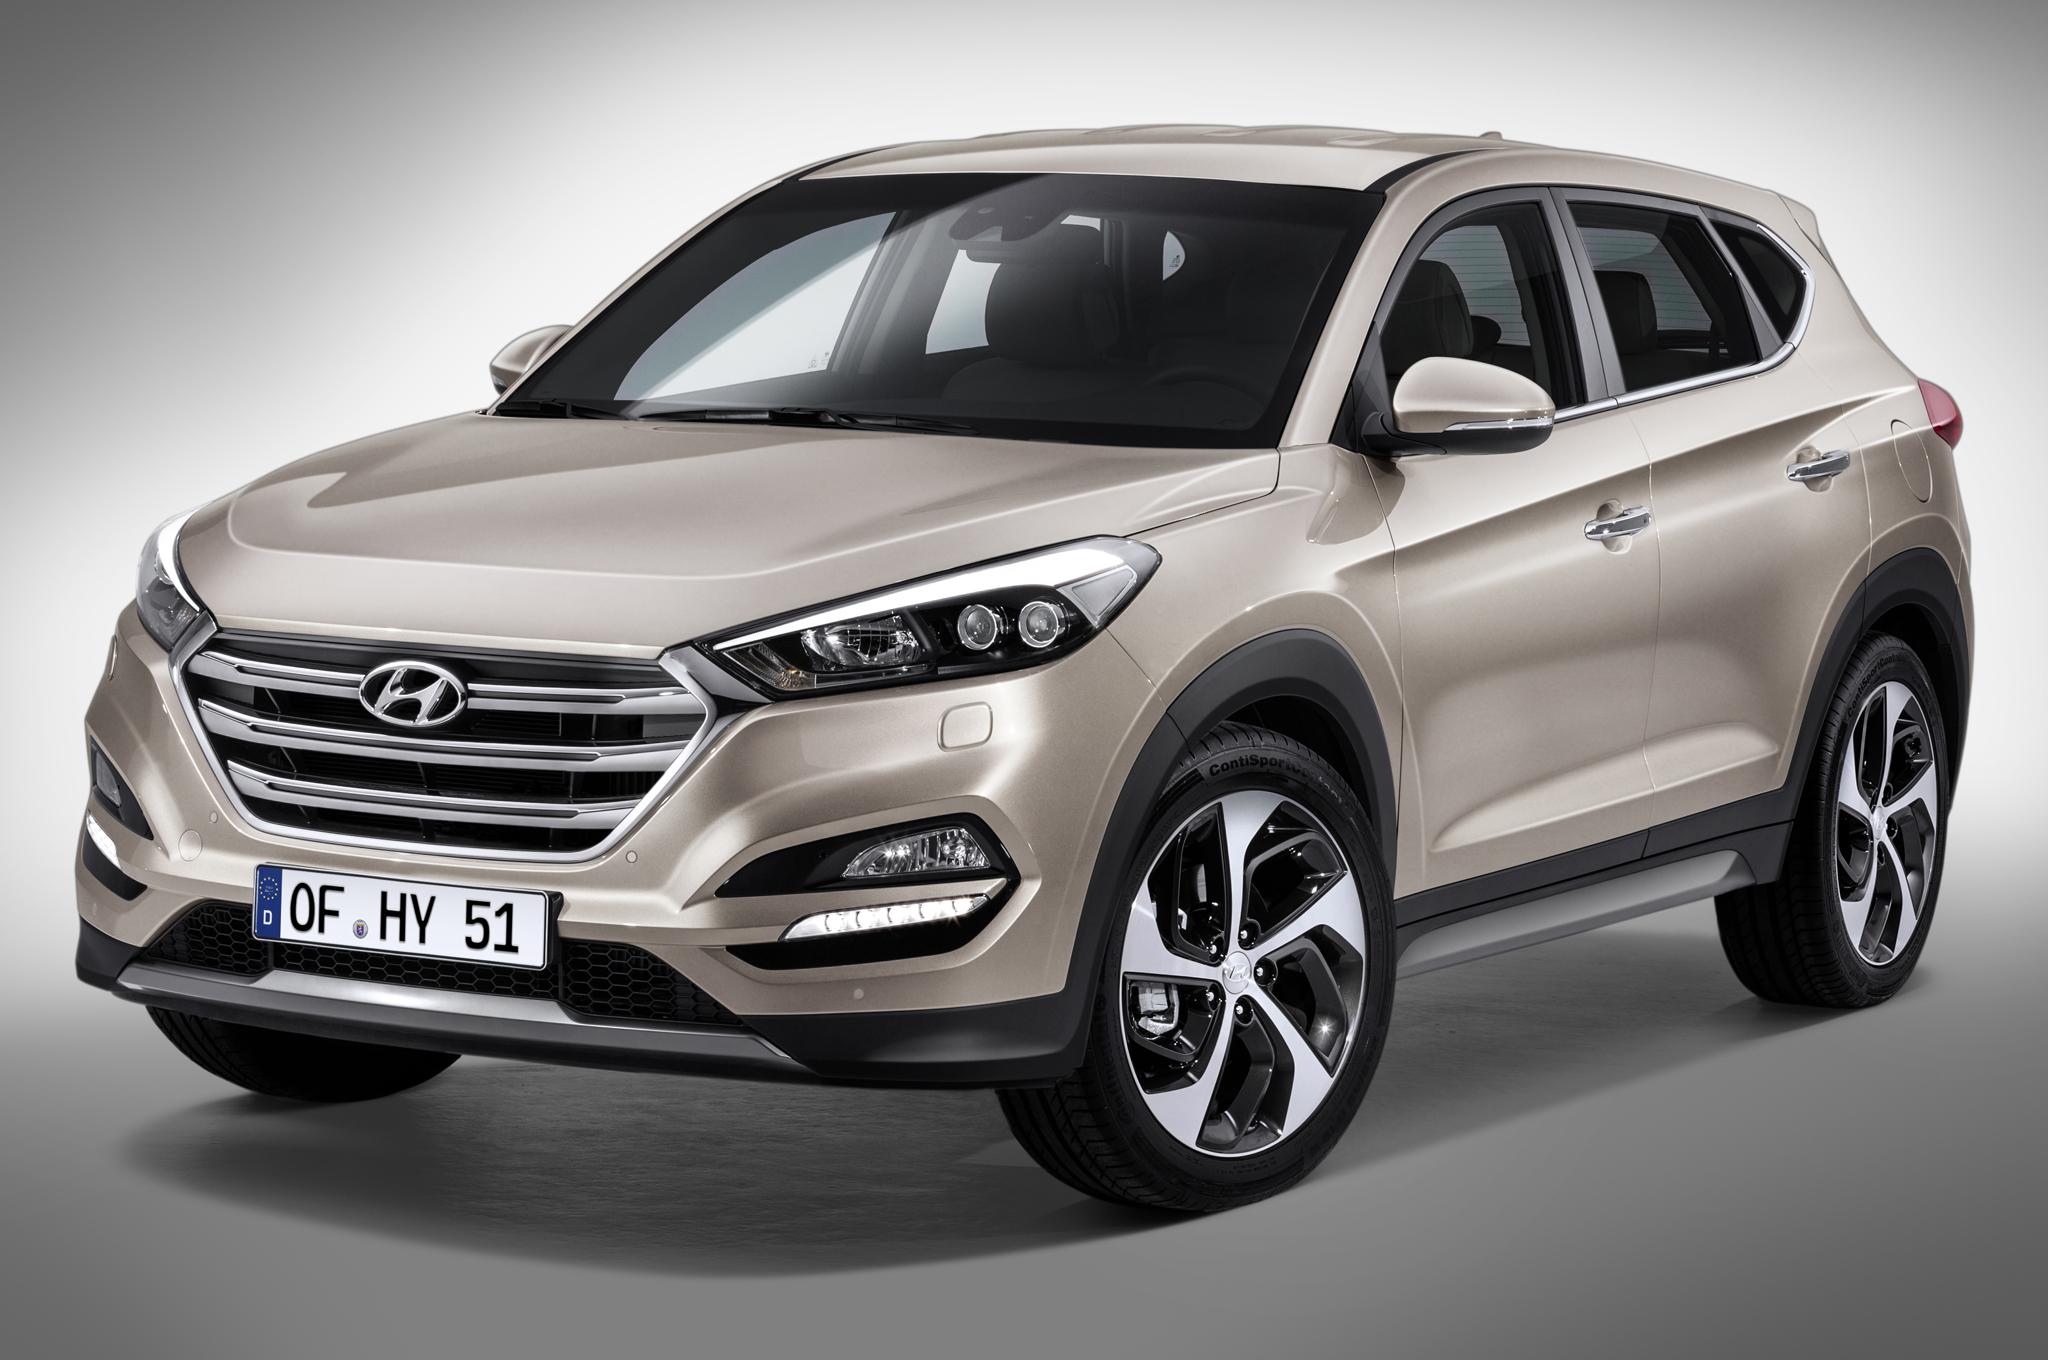 Pack led Hyundai tucson intérieur france xenon